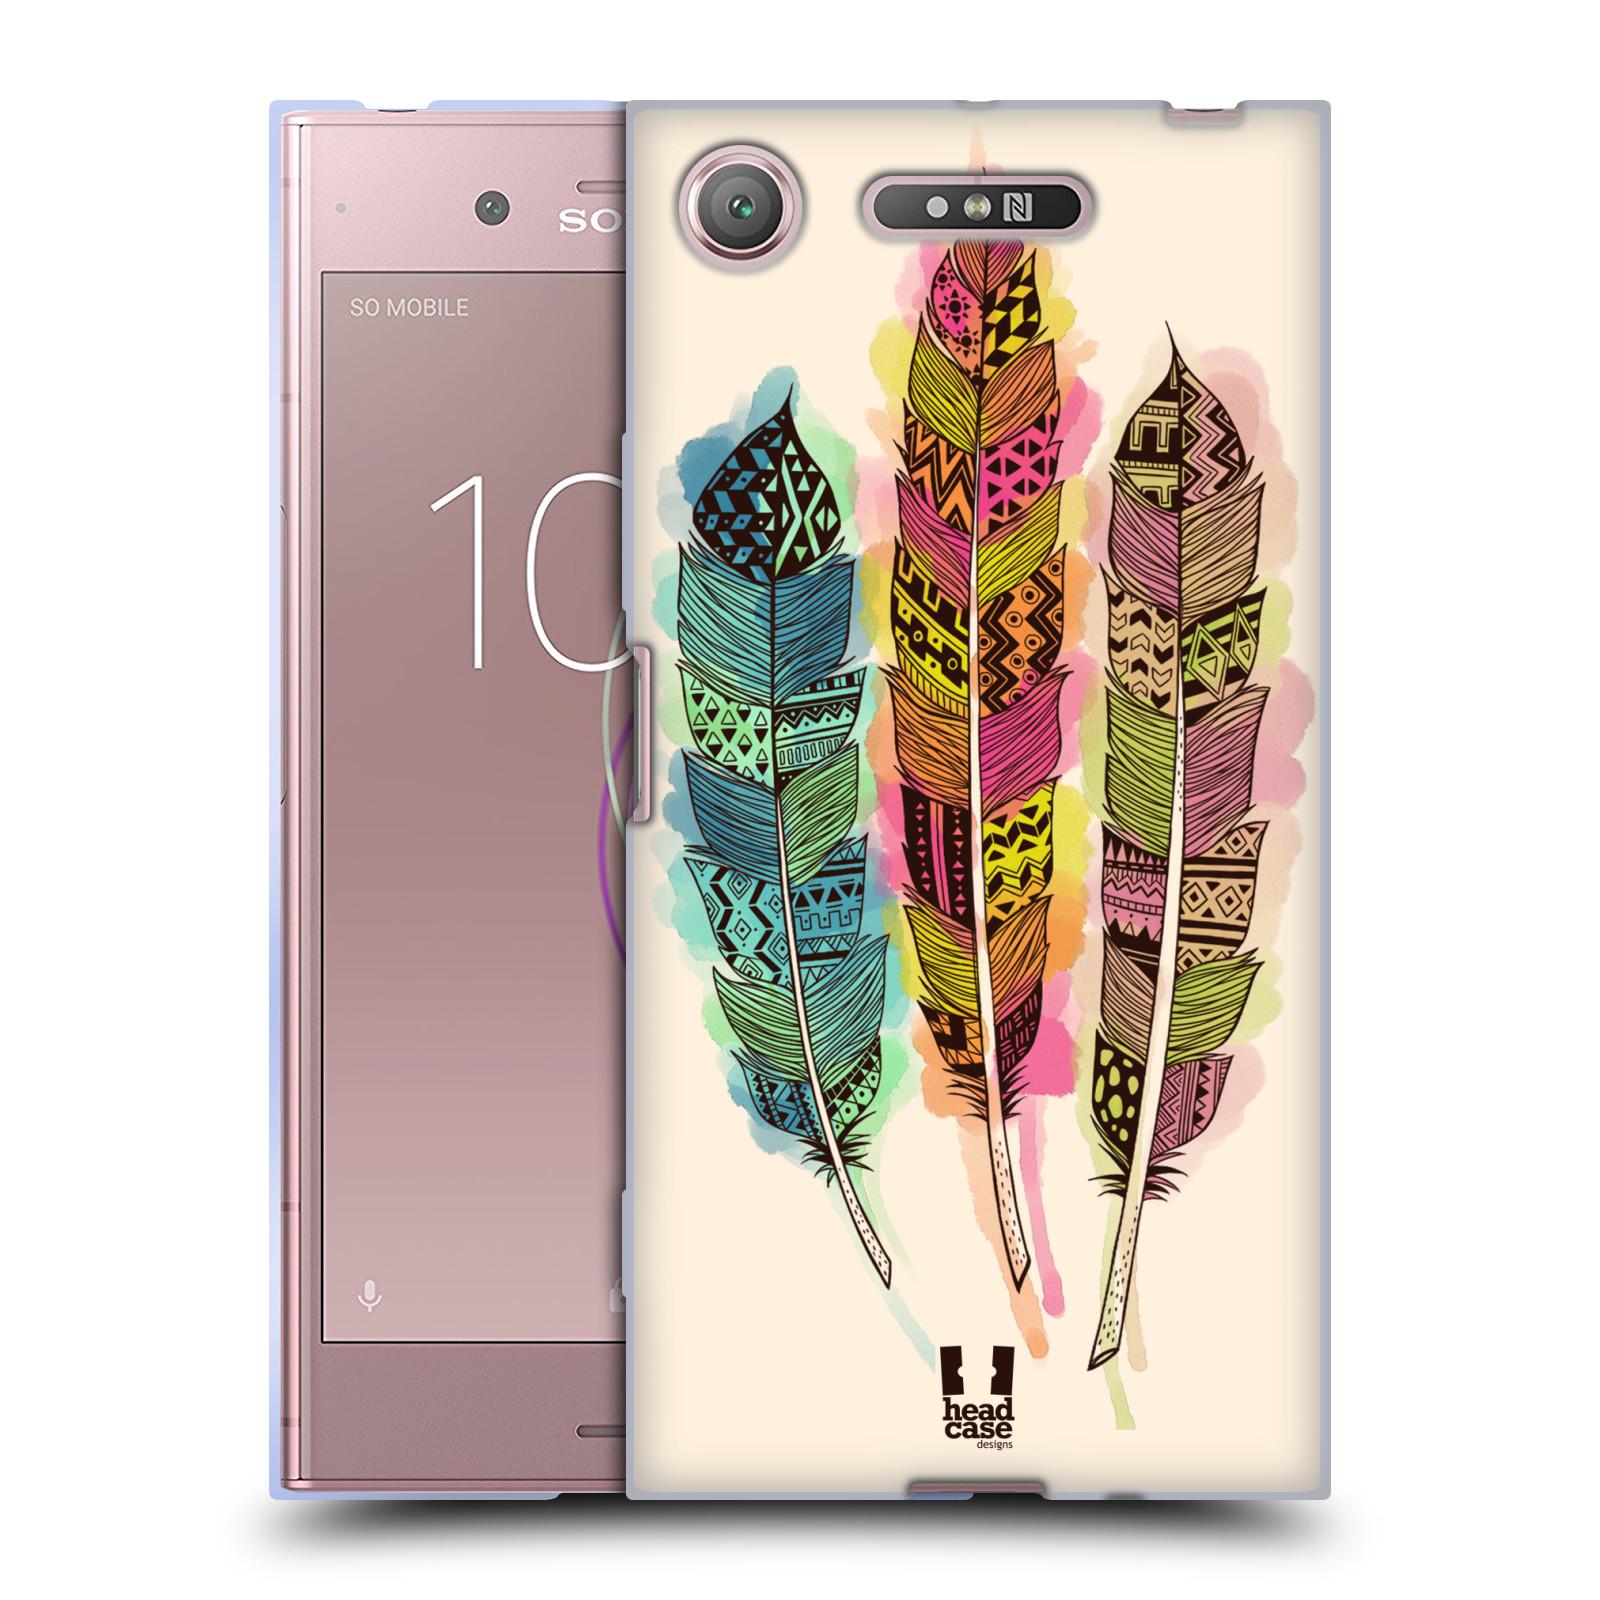 Silikonové pouzdro na mobil Sony Xperia XZ1 - Head Case - AZTEC PÍRKA SPLASH